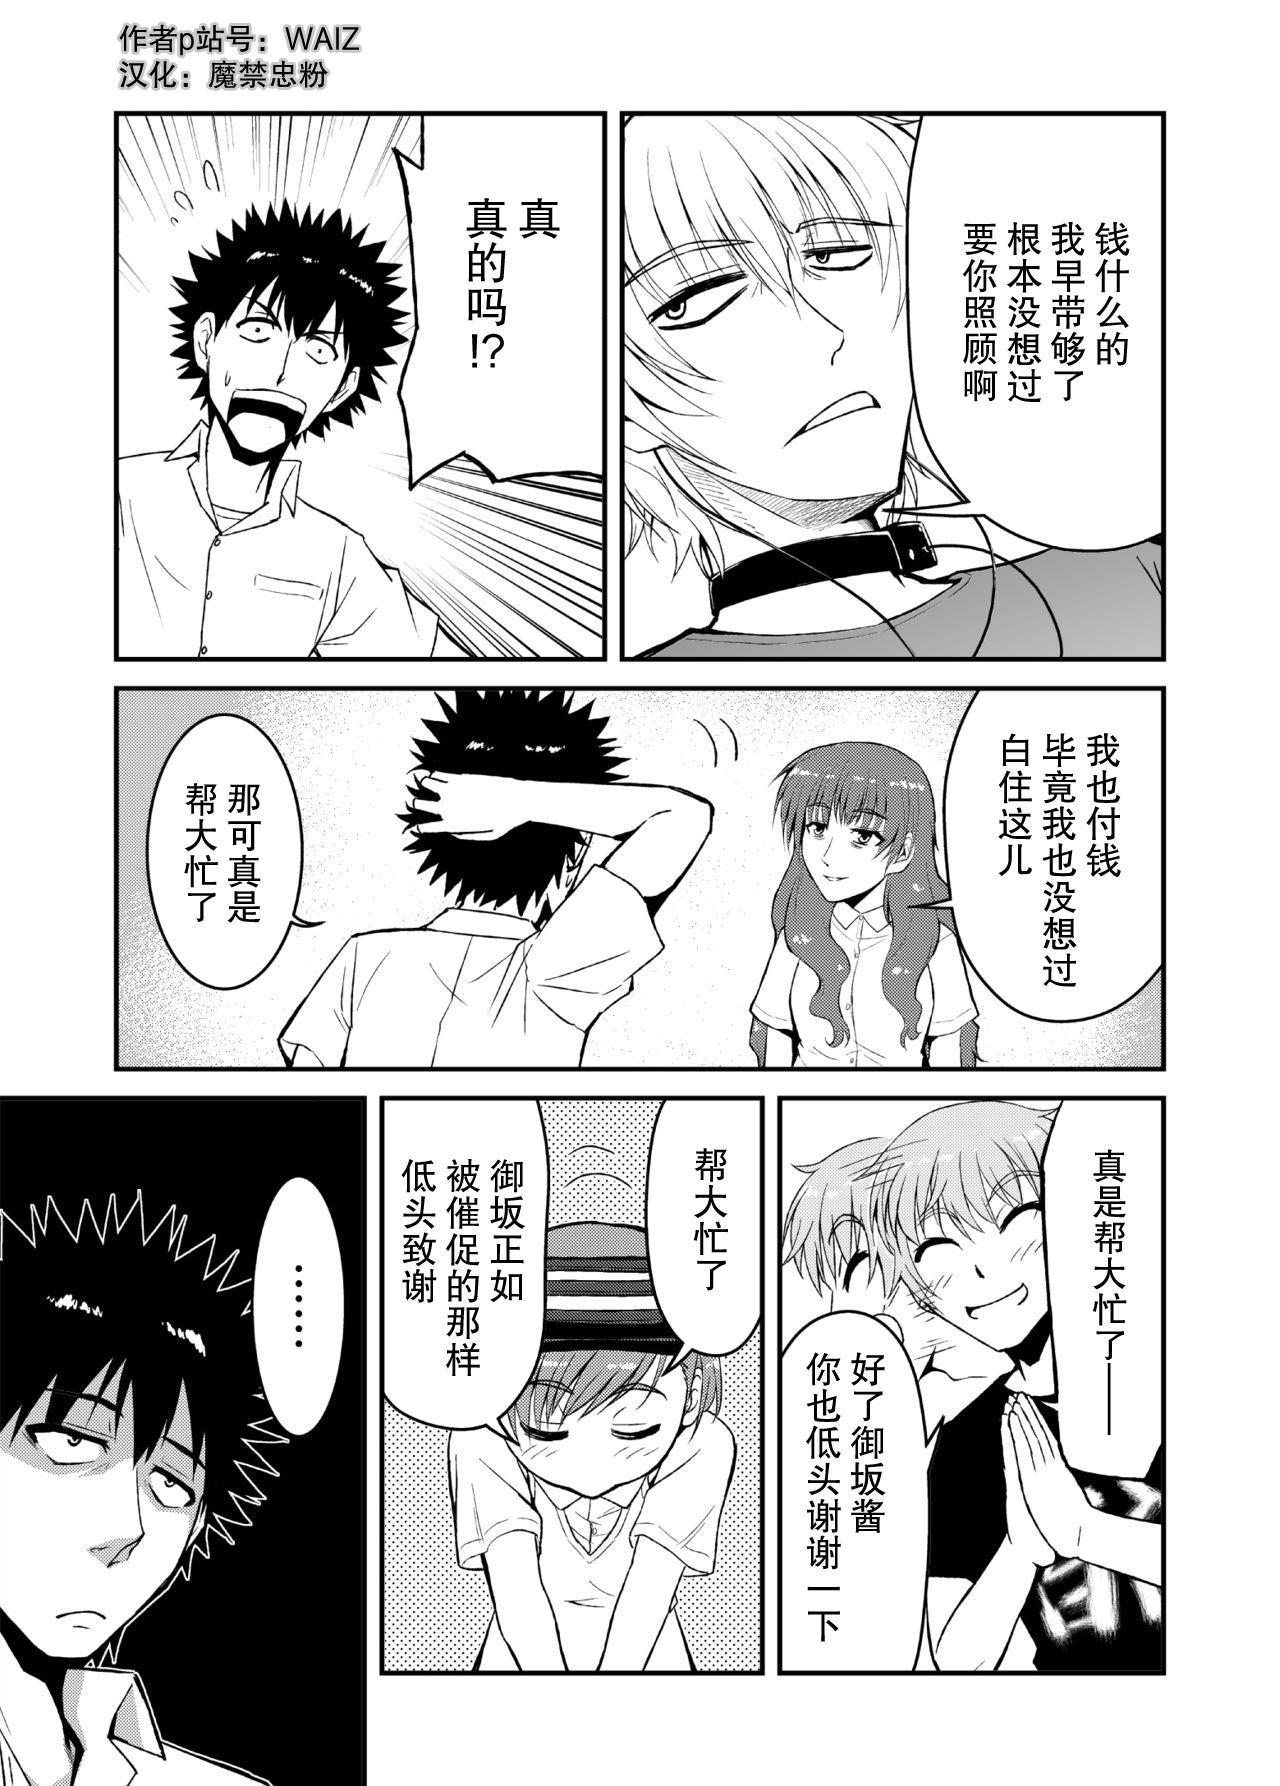 [WAIZ][同人个人渣汉化][就算是上条先生我家要住7个人还是太勉强了](Toaru Majutsu no Index) [中国翻译] 36